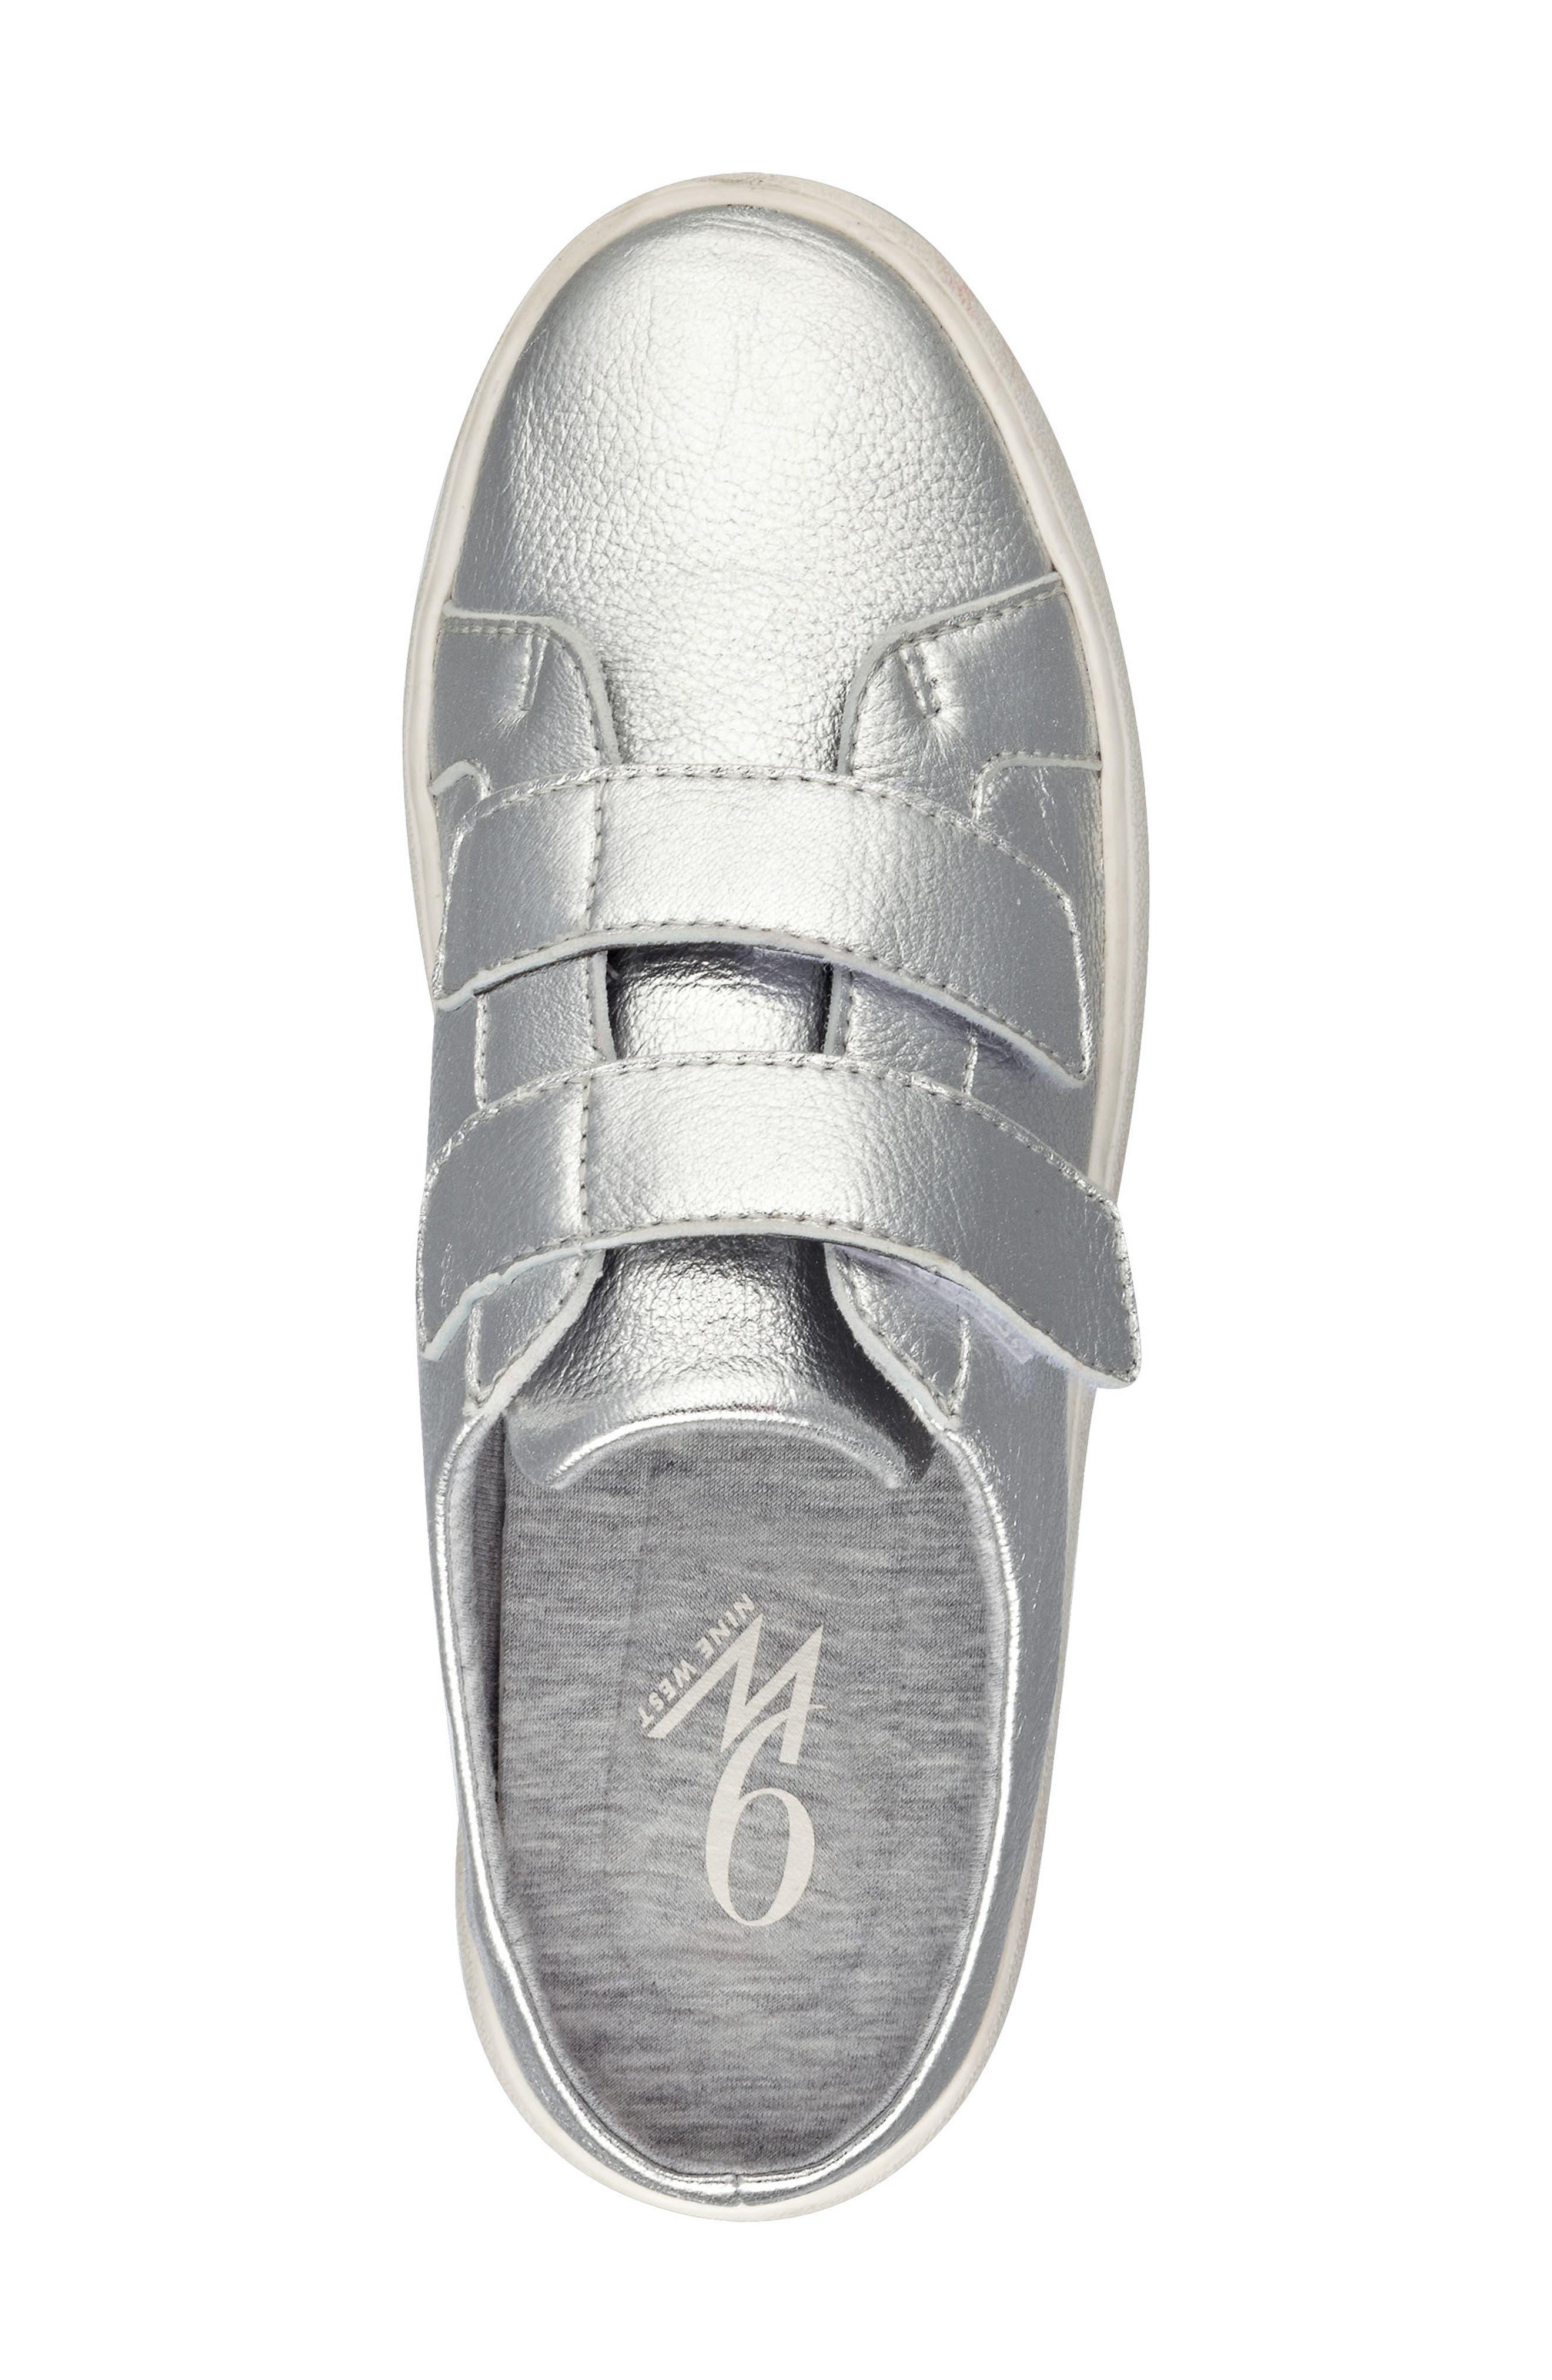 Poeton Sneaker Mule,                             Alternate thumbnail 9, color,